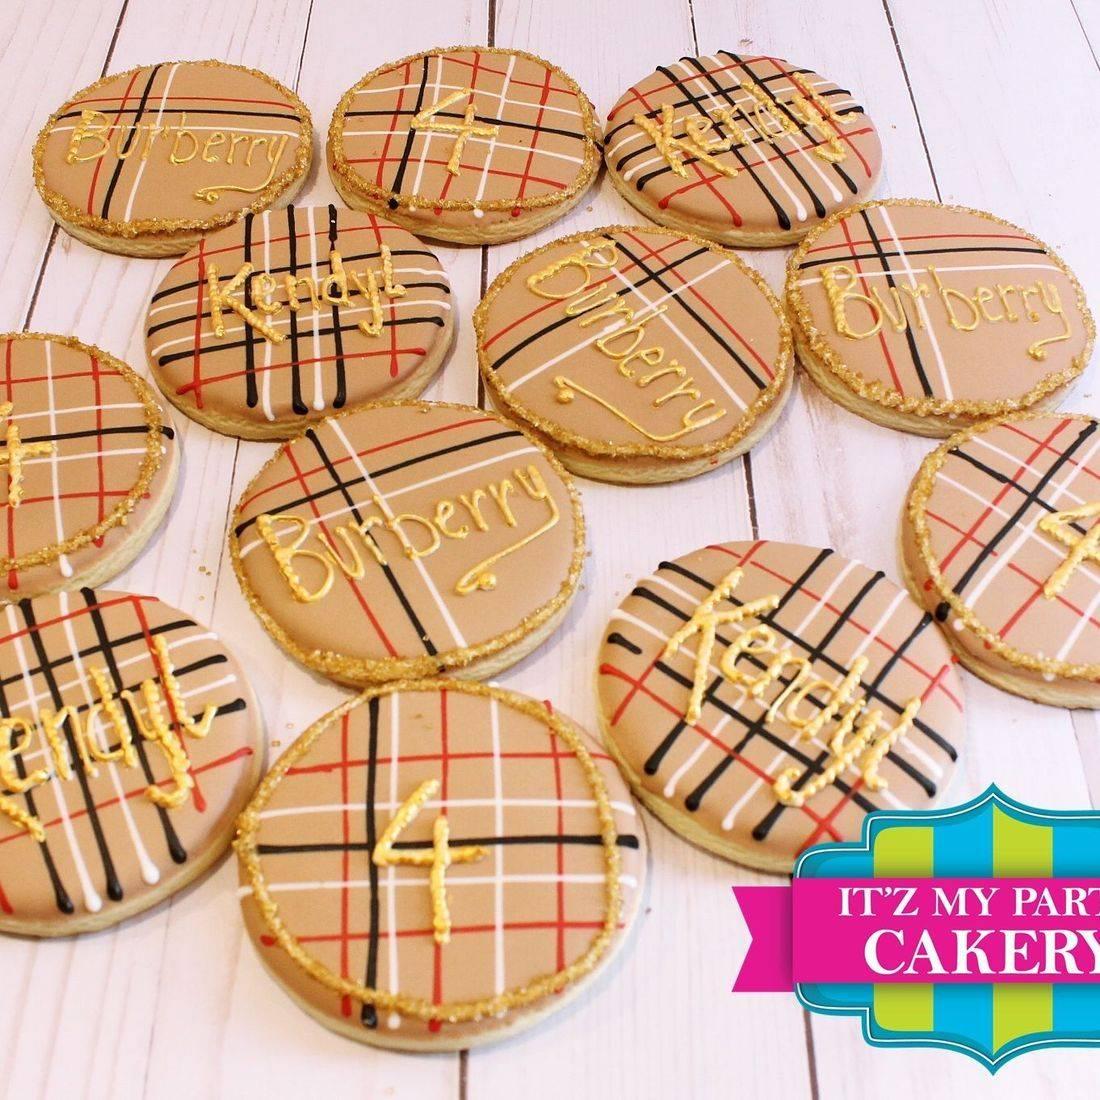 Burberry Inspired Cookies Milwaukee